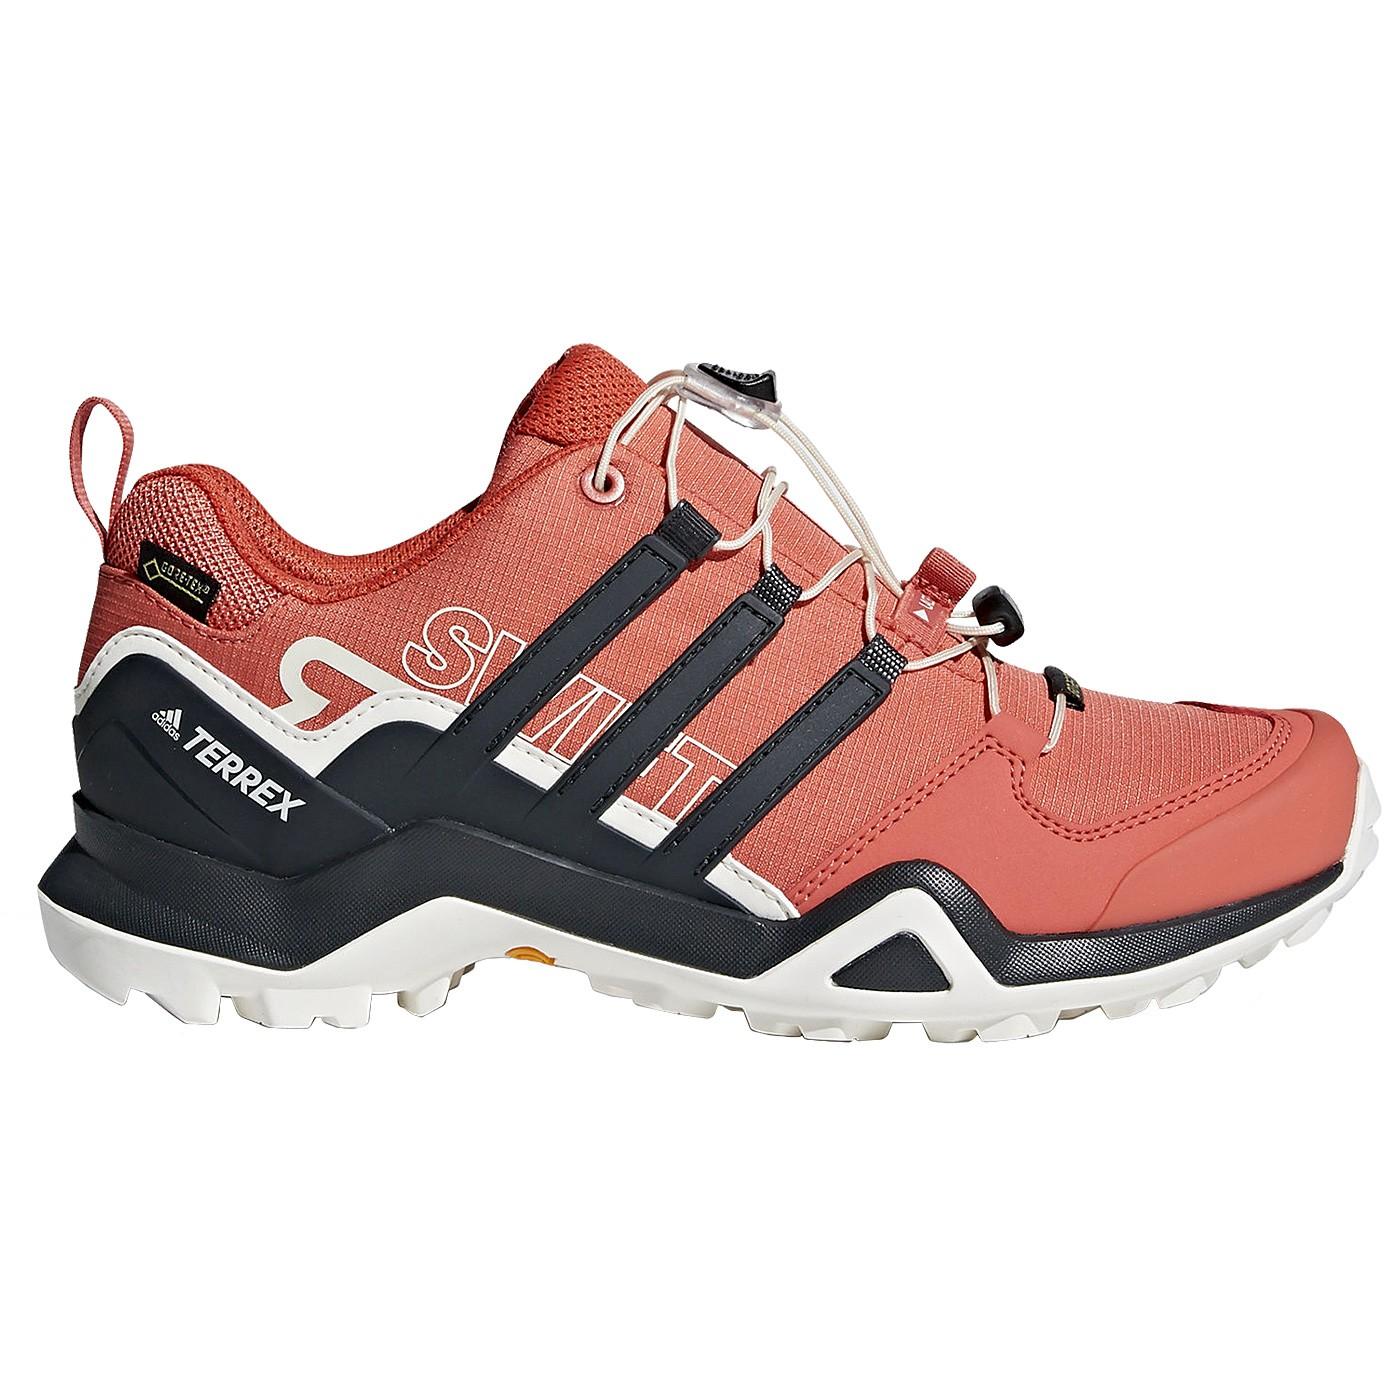 Chaussures hiking Adidas Terrex Swift R2 Gtx Femme rose